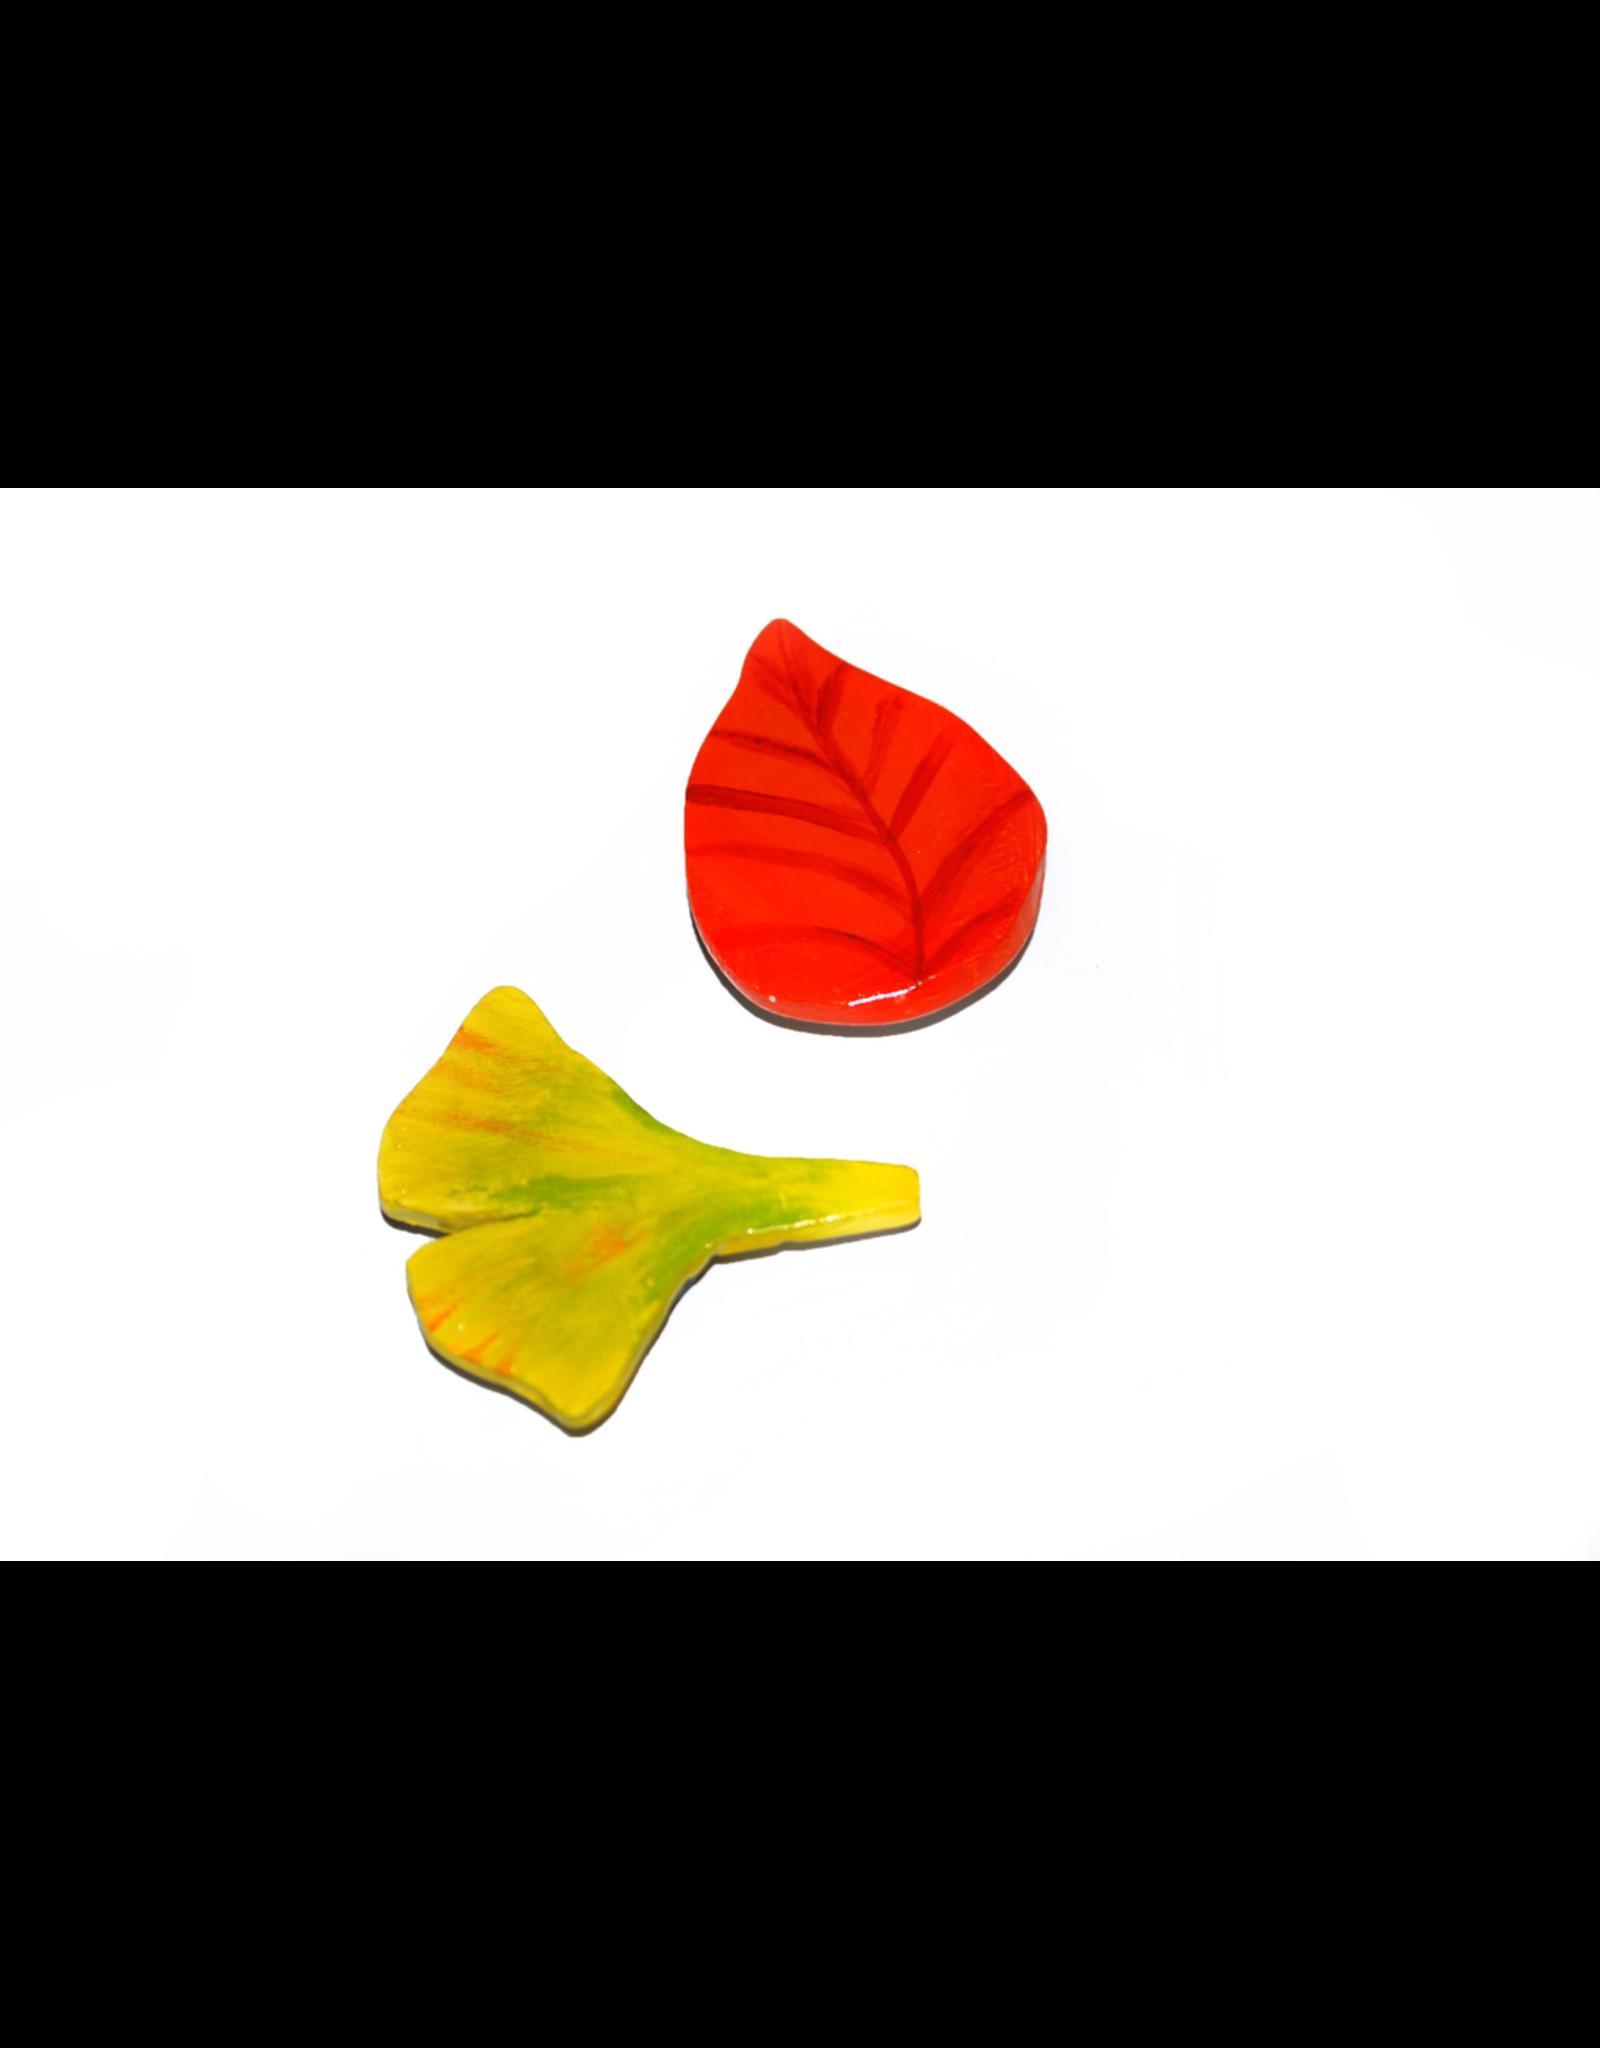 Alli Davis Fall and Ginko Leaf Magnet Set, Alli Davis